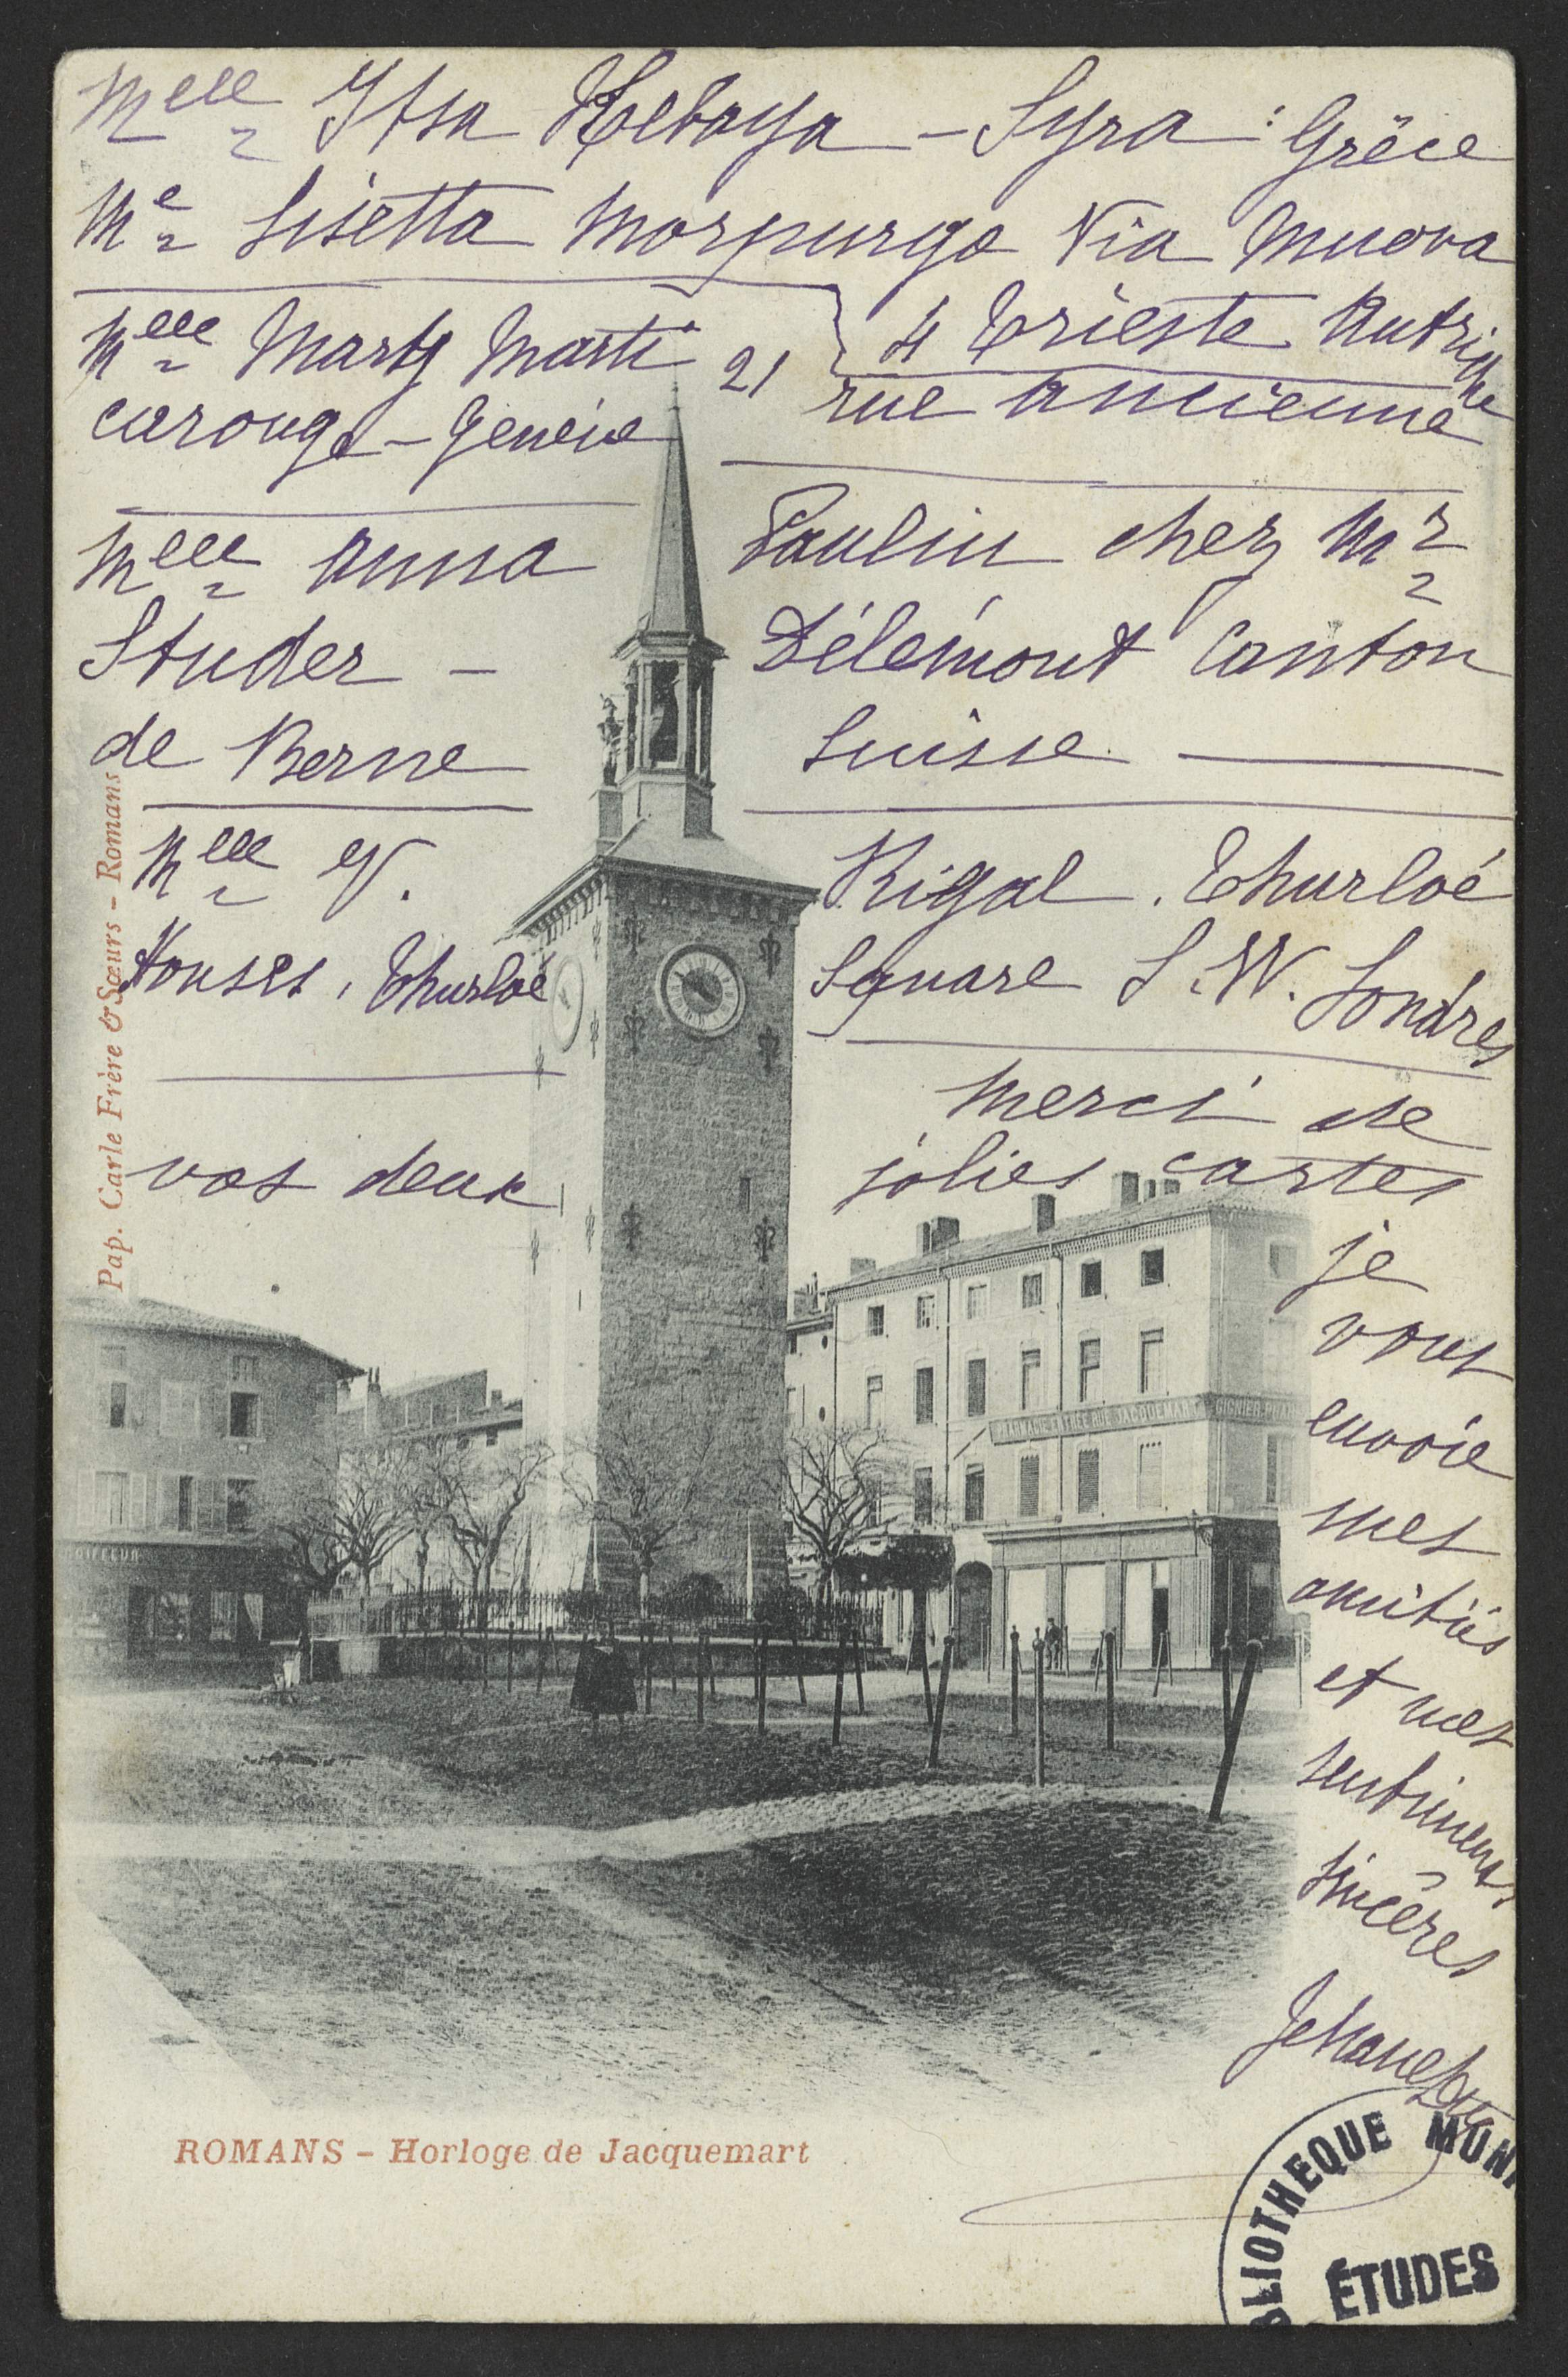 Romans - Horloge de Jacquemart